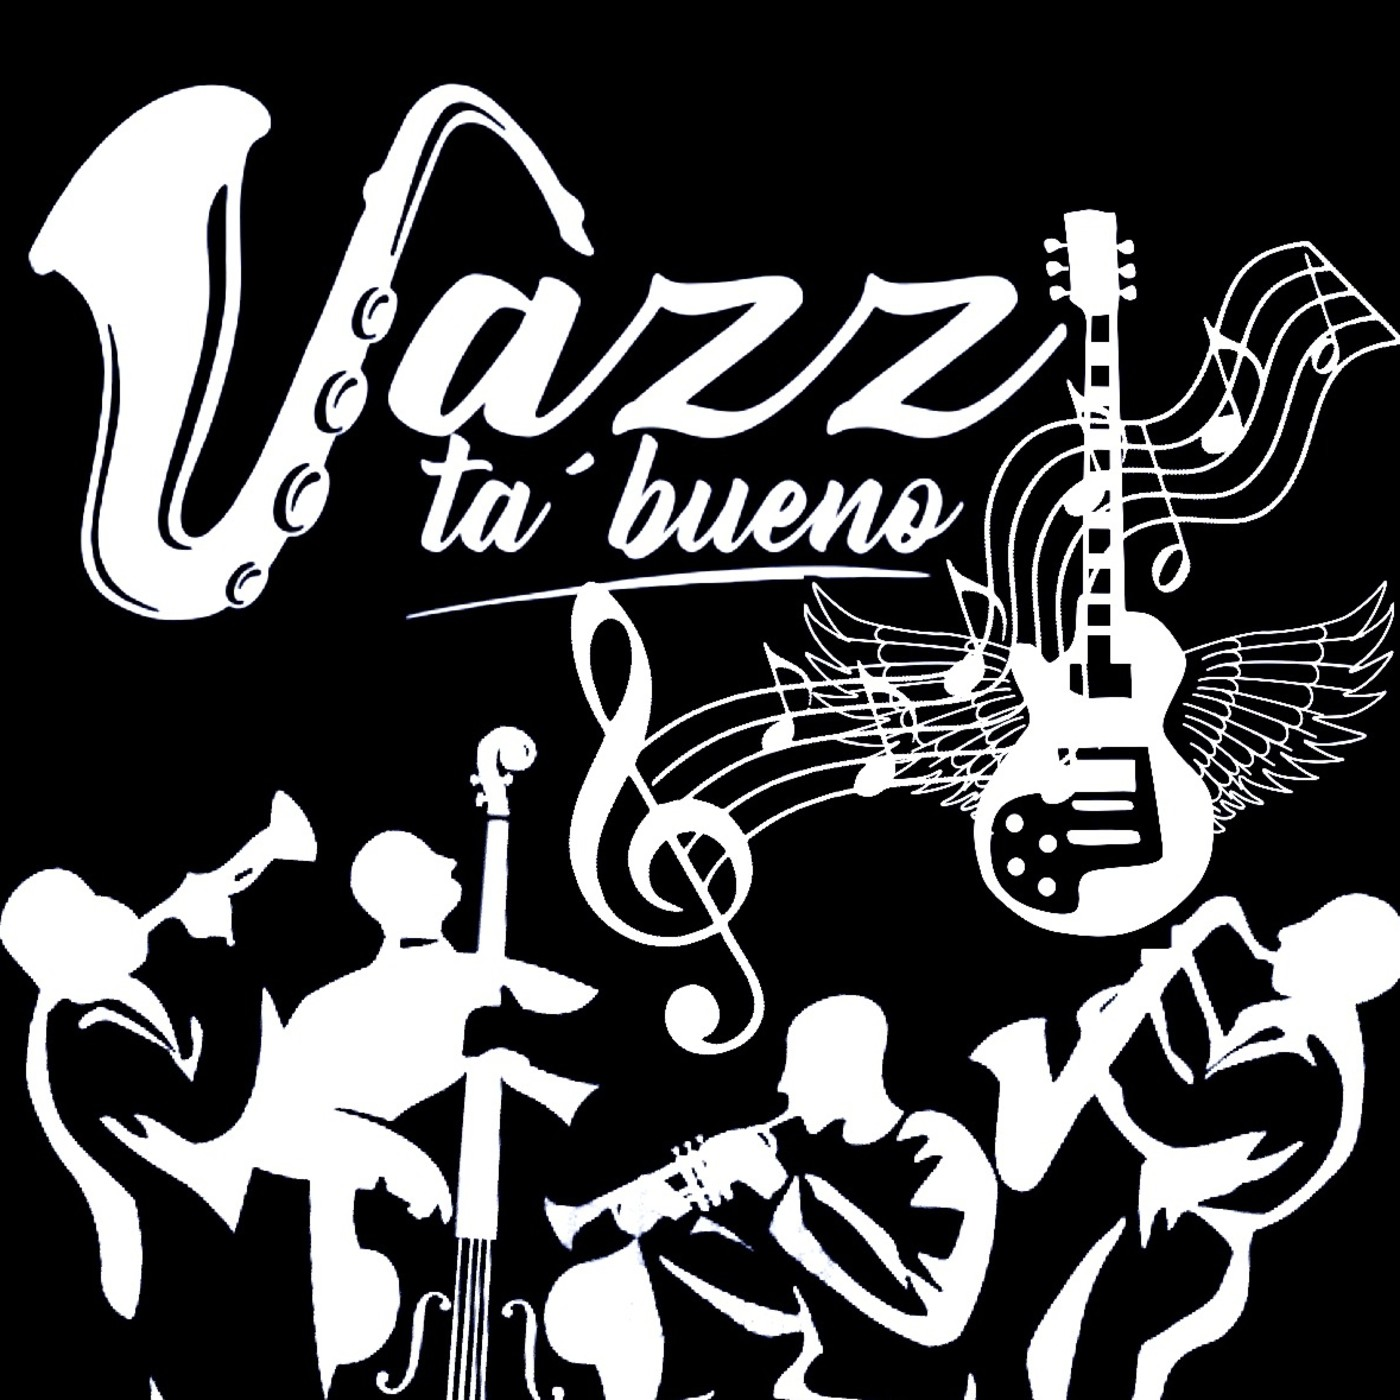 JazzTaBueno 16/2021 *Jazz / Rock*